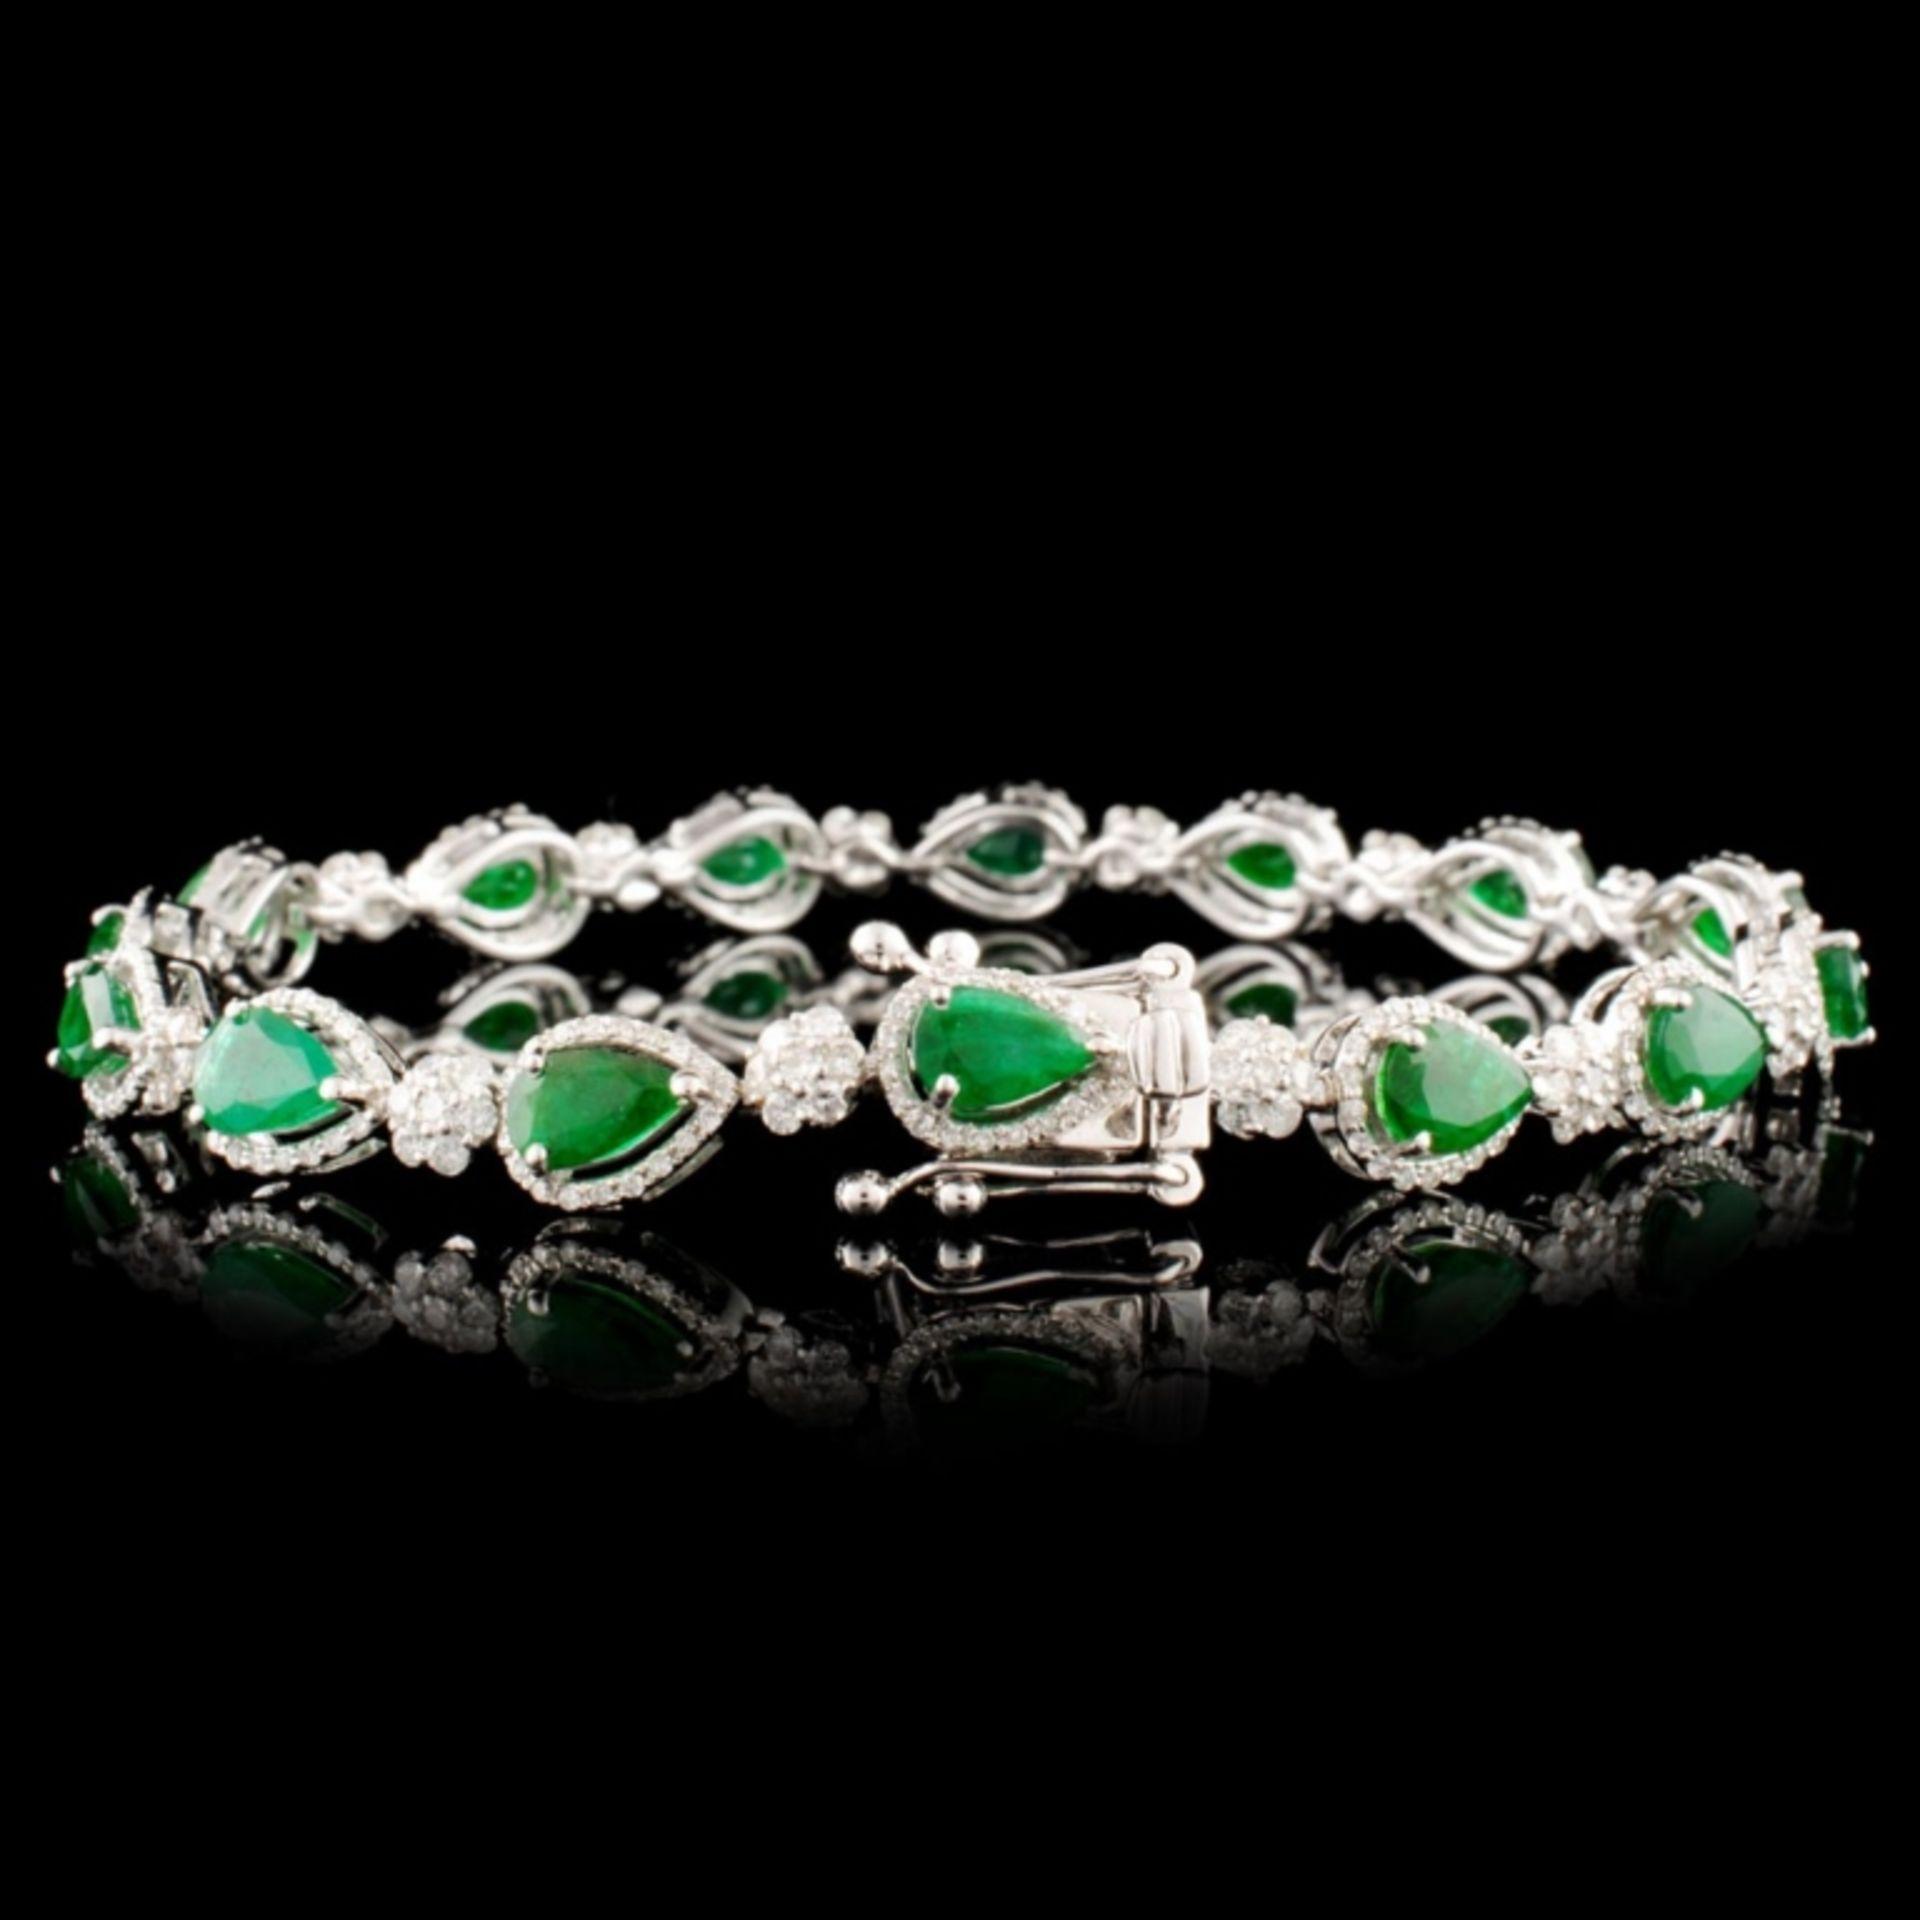 14K Gold 5.47ct Emerald & 1.83ctw Diamond Bracelet - Image 2 of 4